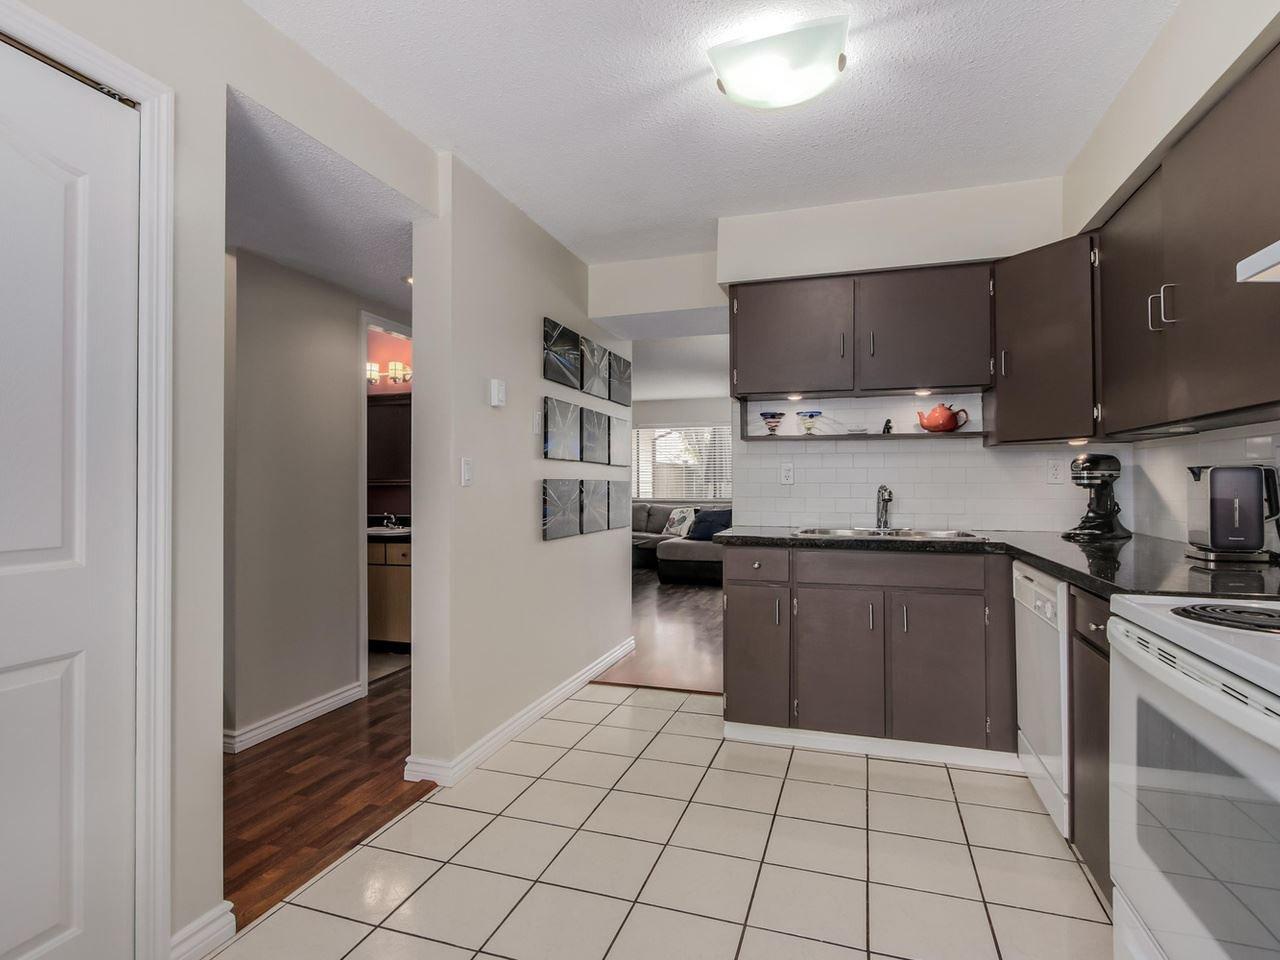 "Photo 9: Photos: 60 4800 TRIMARAN Drive in Richmond: Steveston South Townhouse for sale in ""BIRCHWOOD ESTATES"" : MLS®# R2069692"